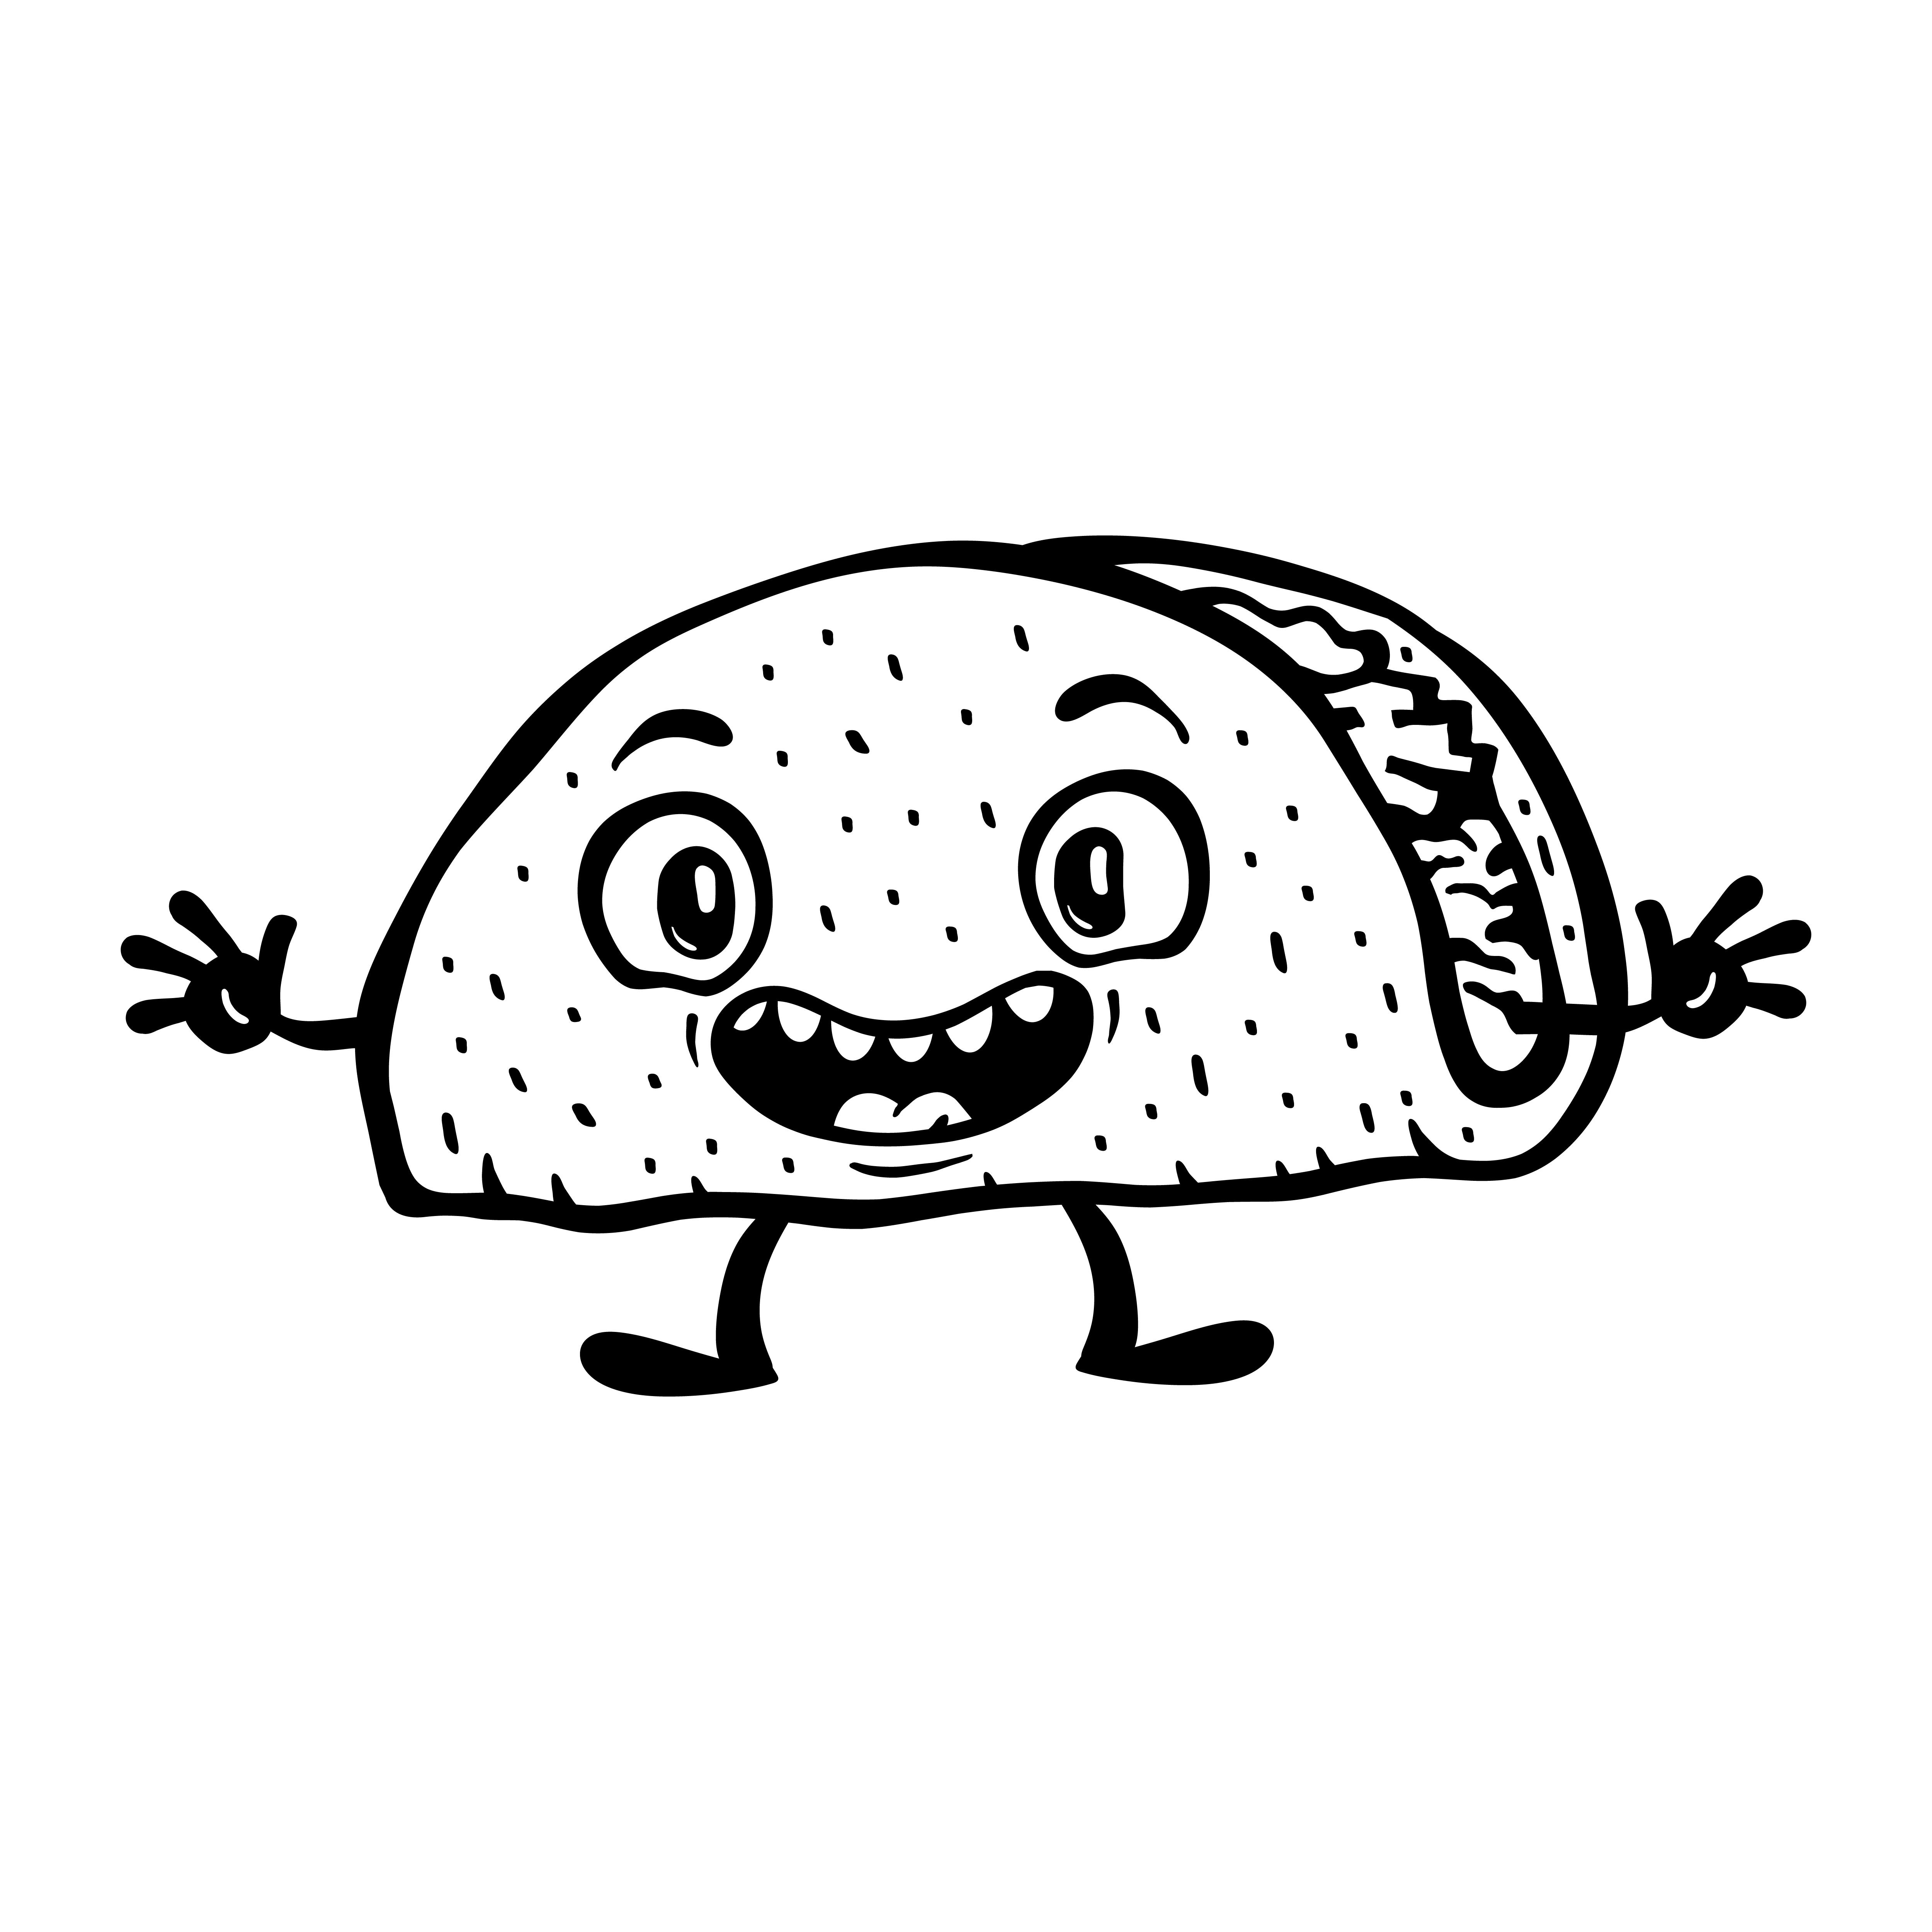 Cute Funny Cartoon Taco Vector Illustration